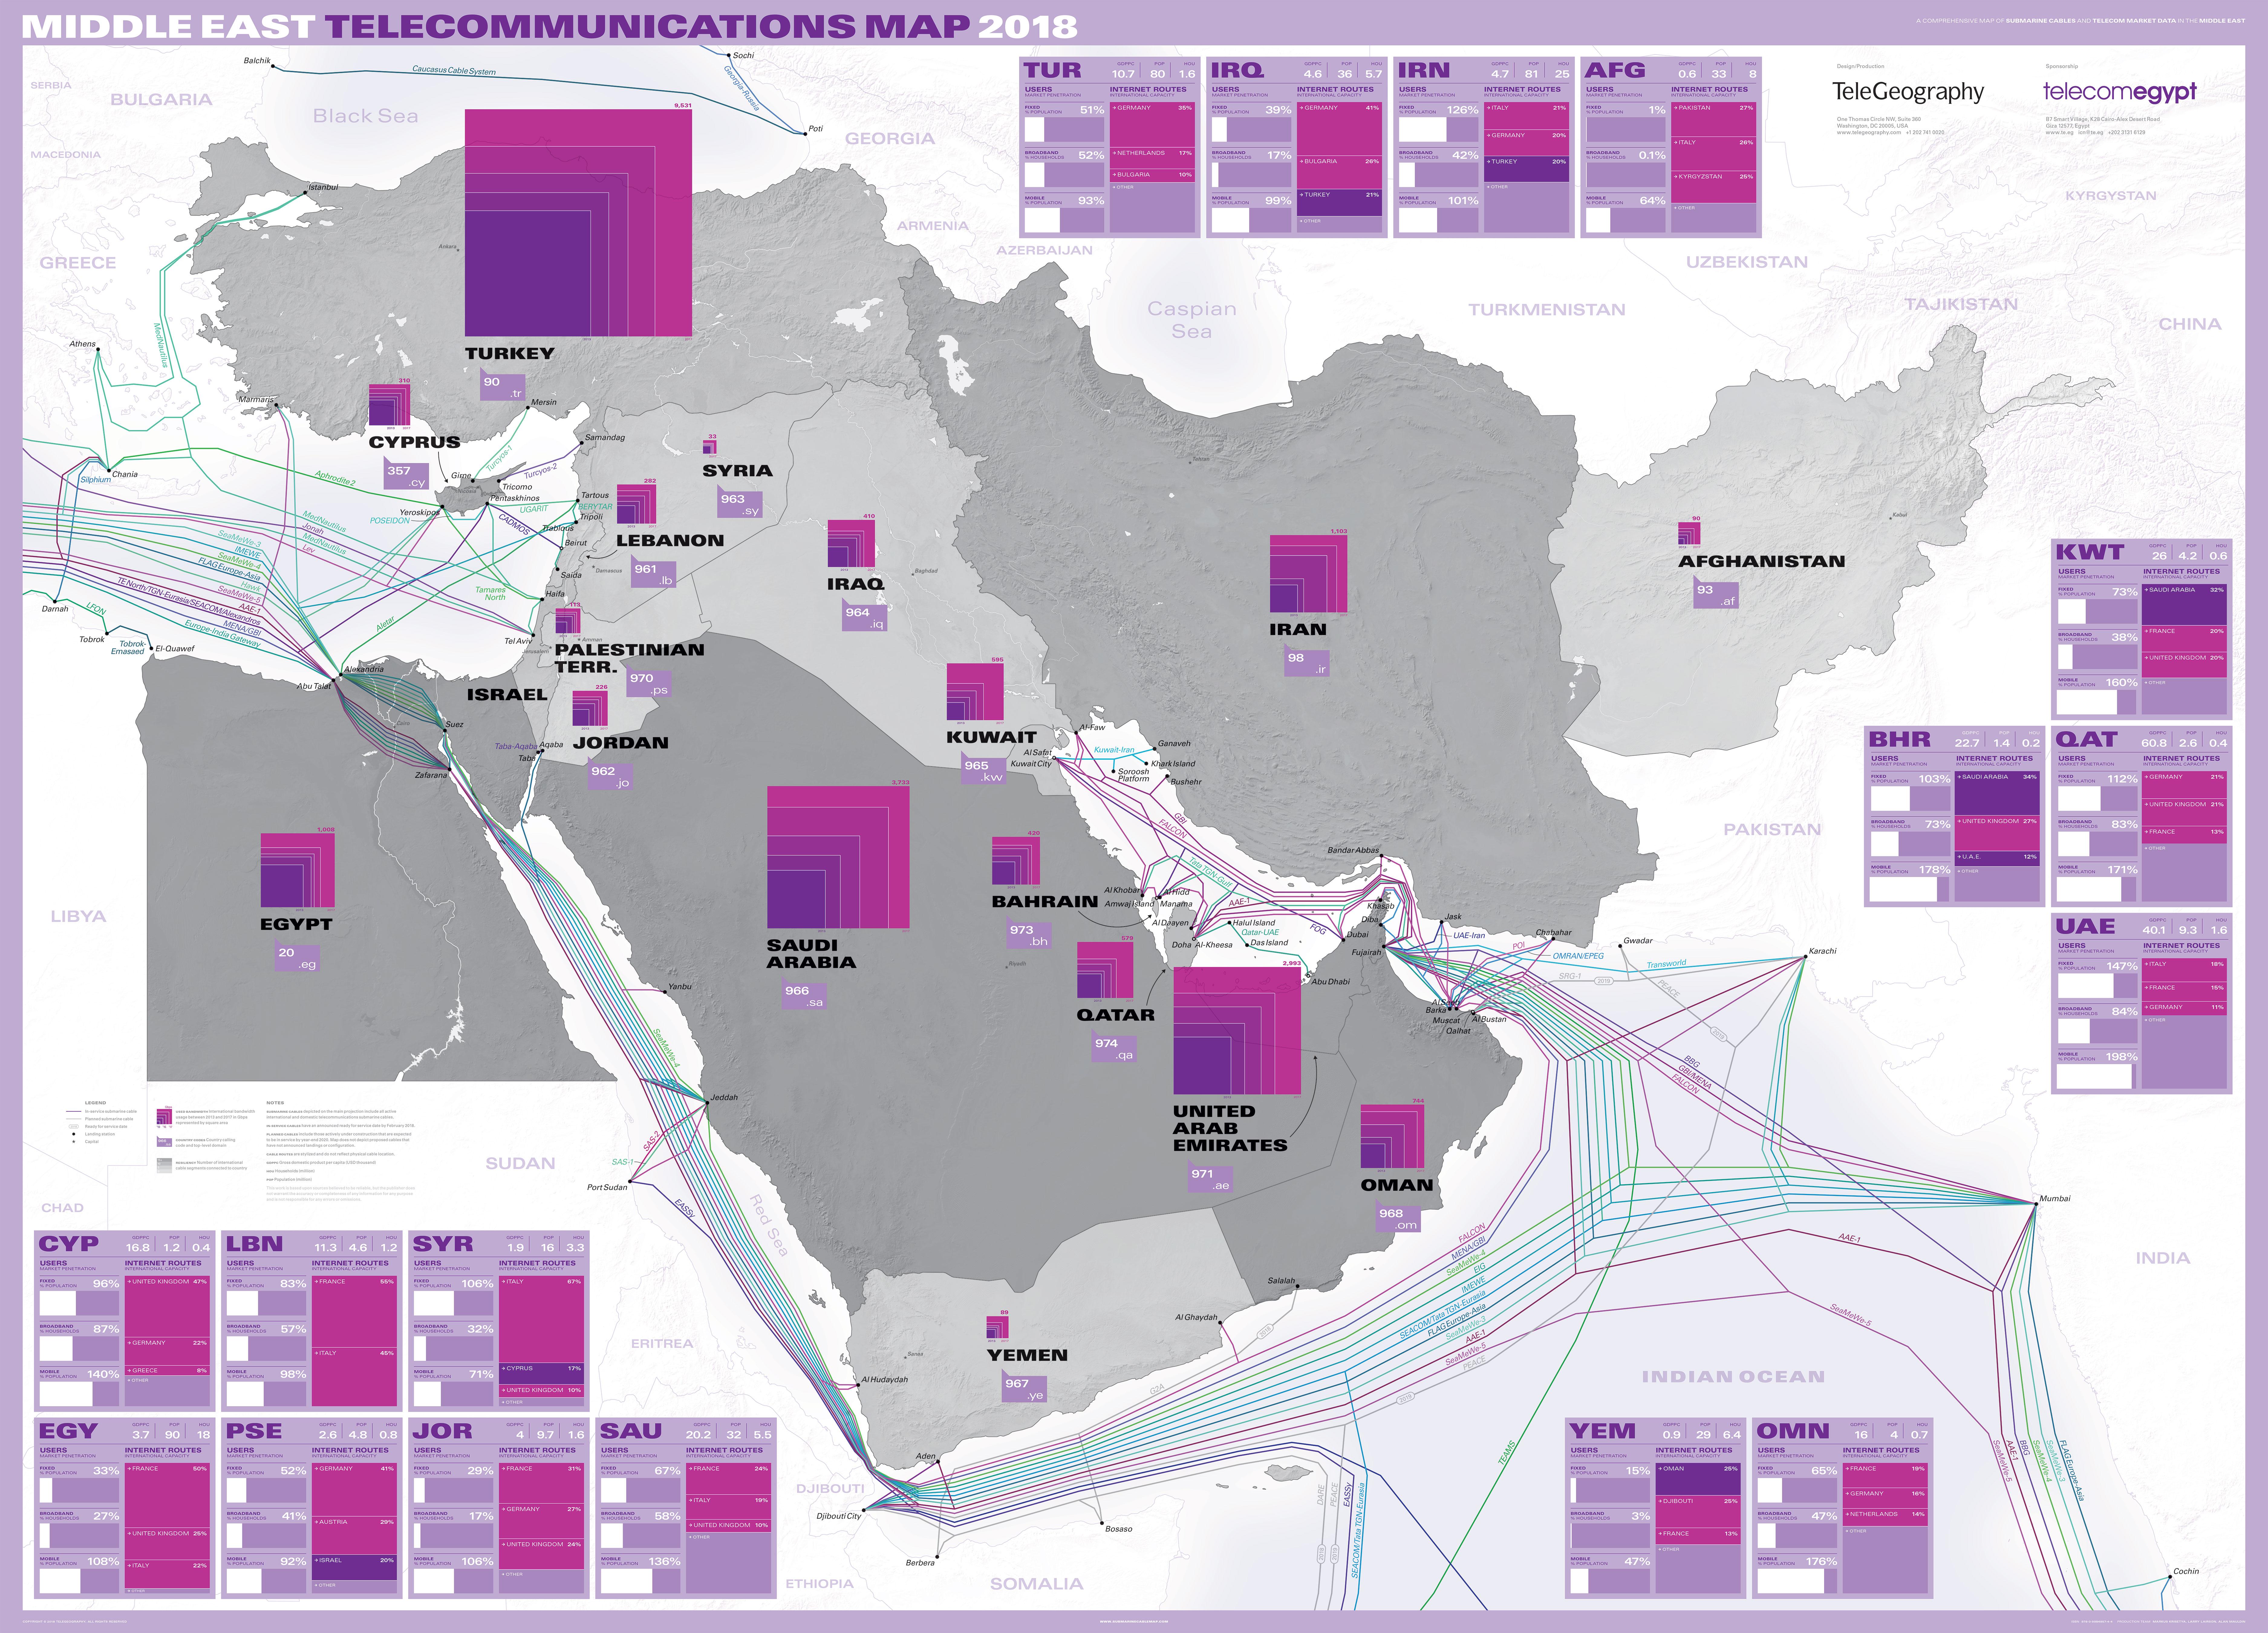 middle-east-telecom-map-2018-medium.jpg